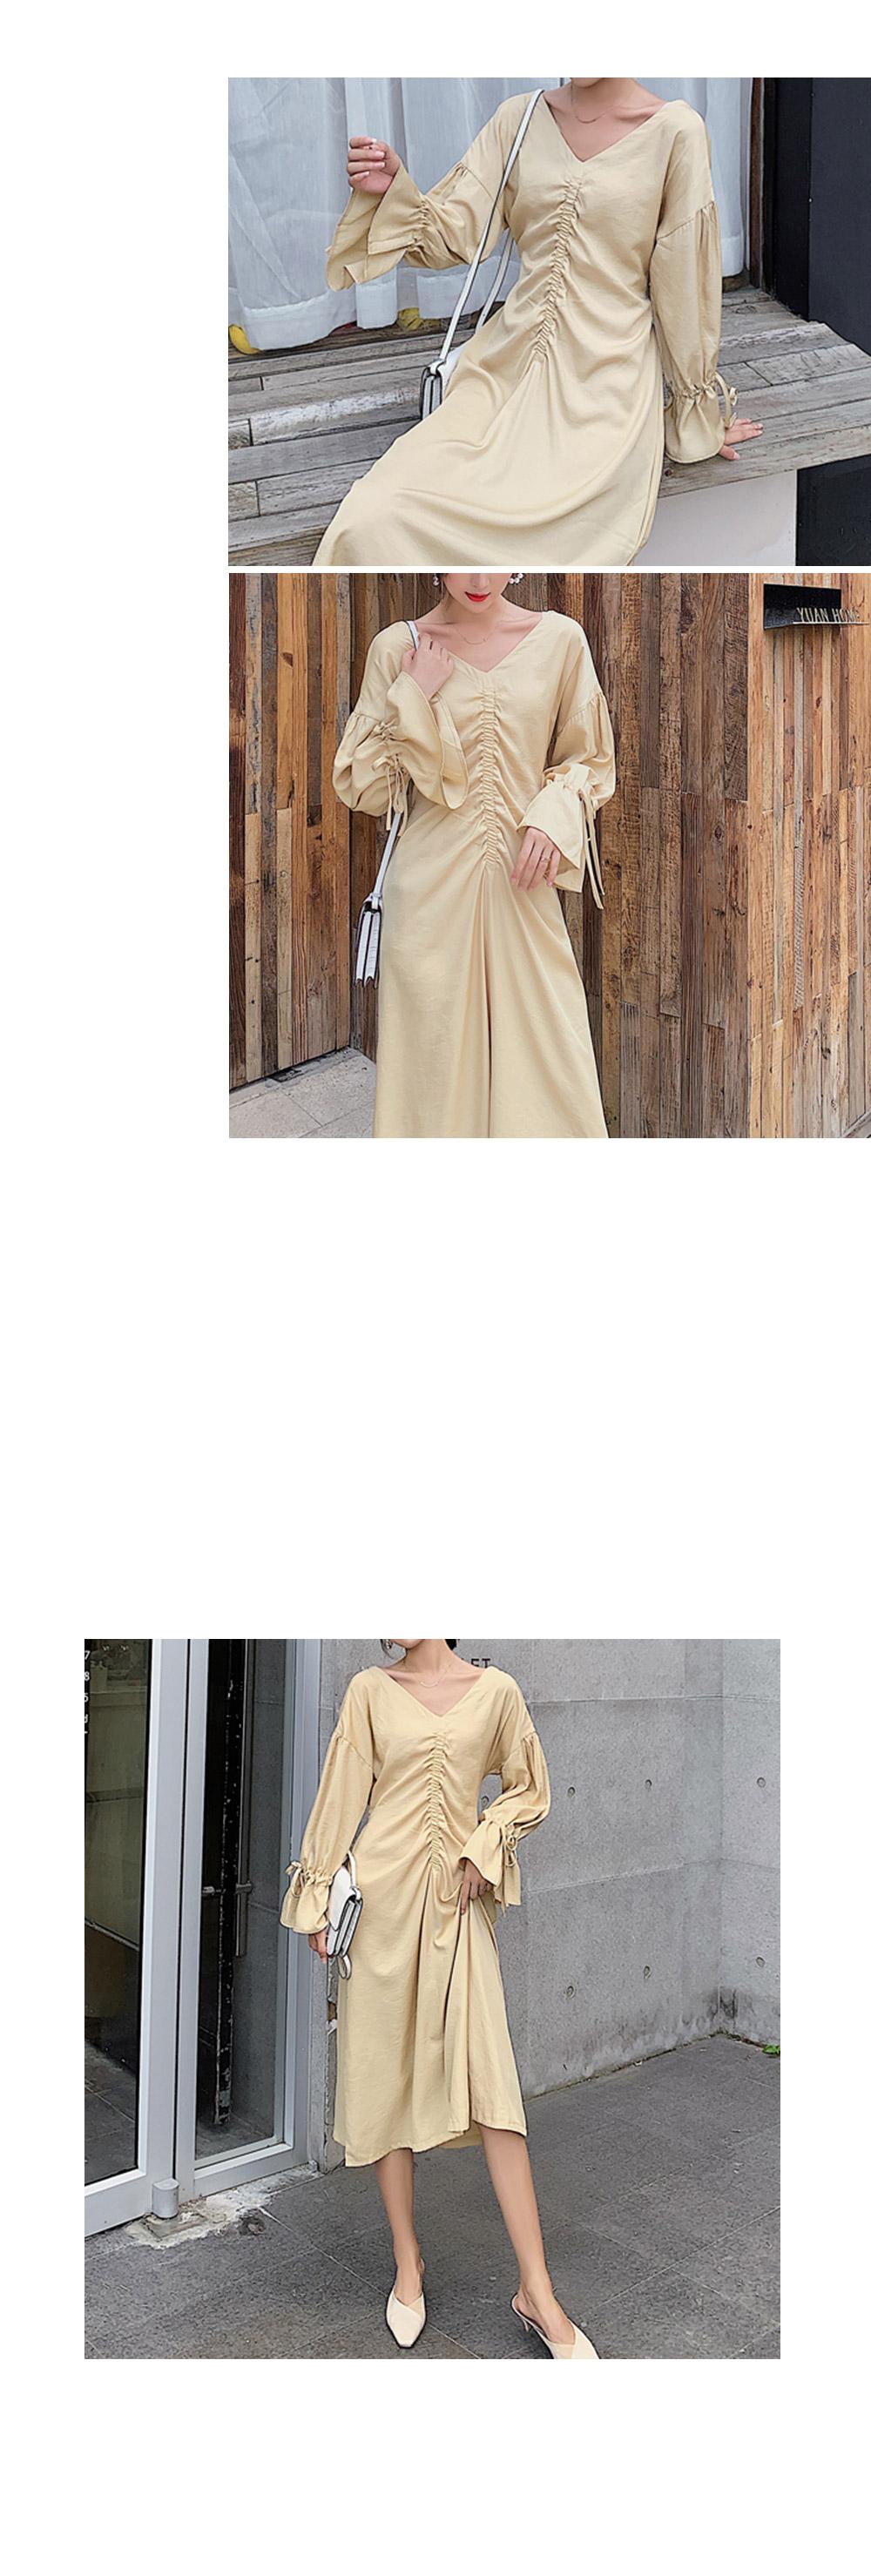 Throat String Dress